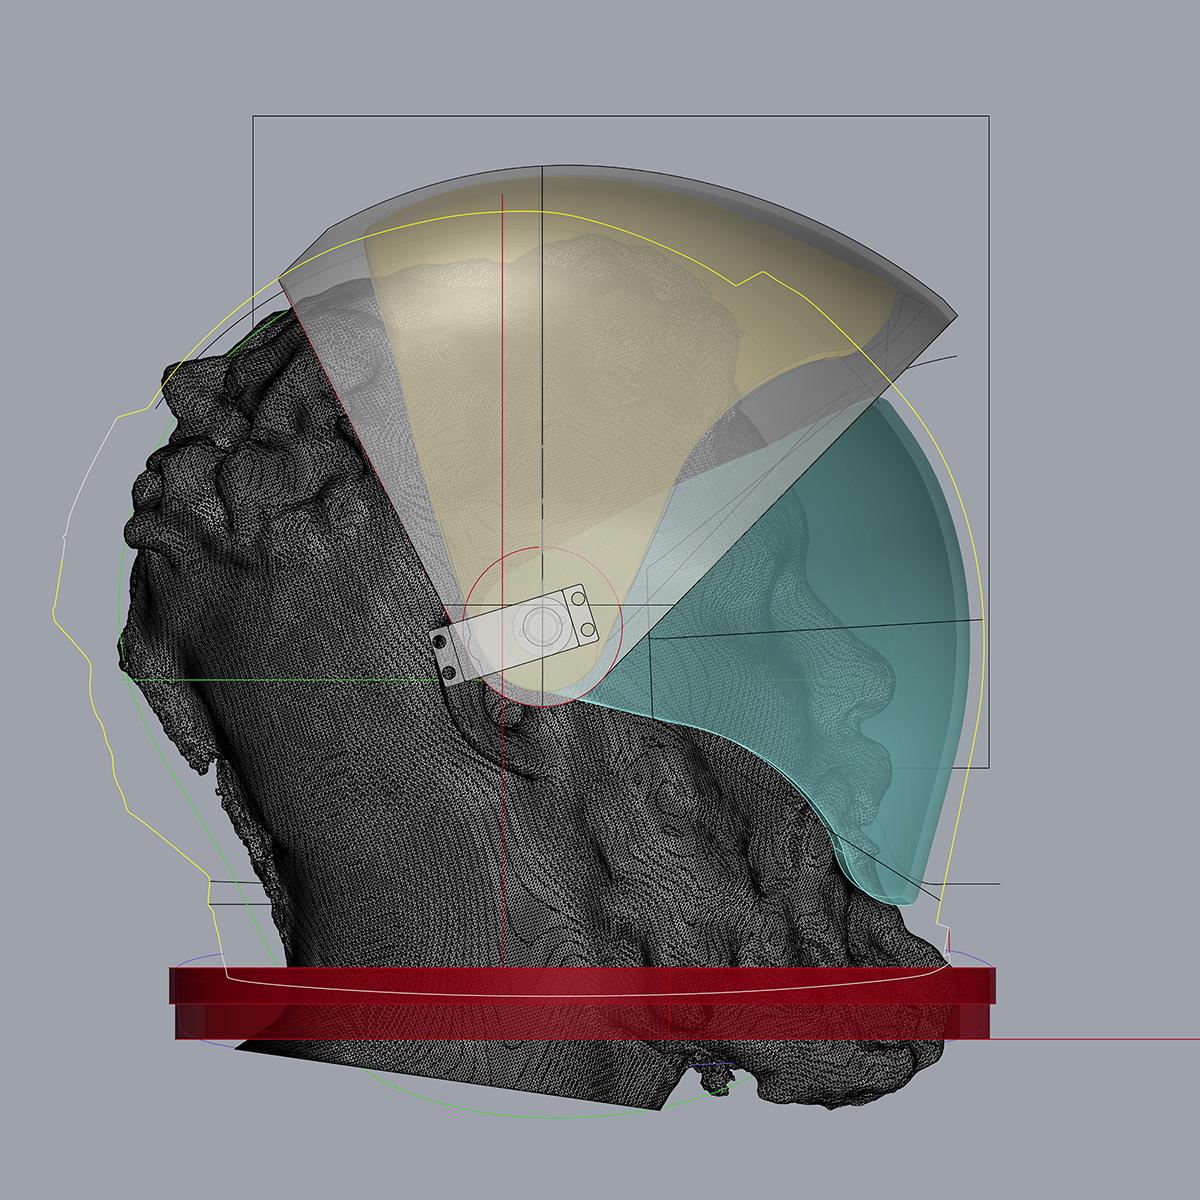 Space Helmet Design (Side View), Sidney Church